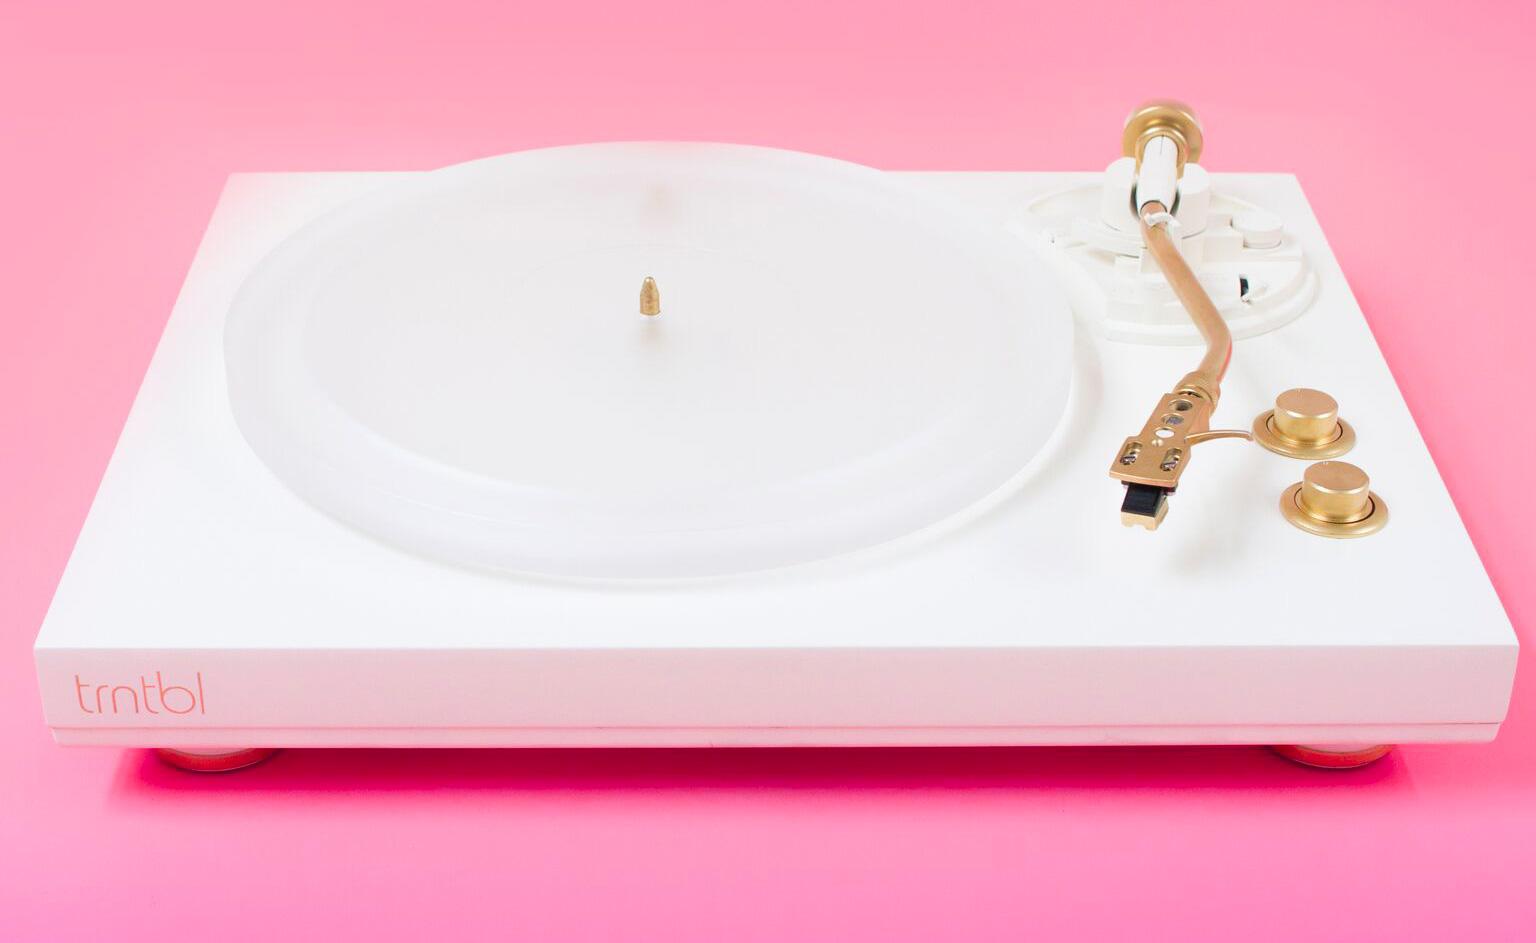 trntbl-vnyl-platine-vynile-connectee-spotify-sans-fil-home